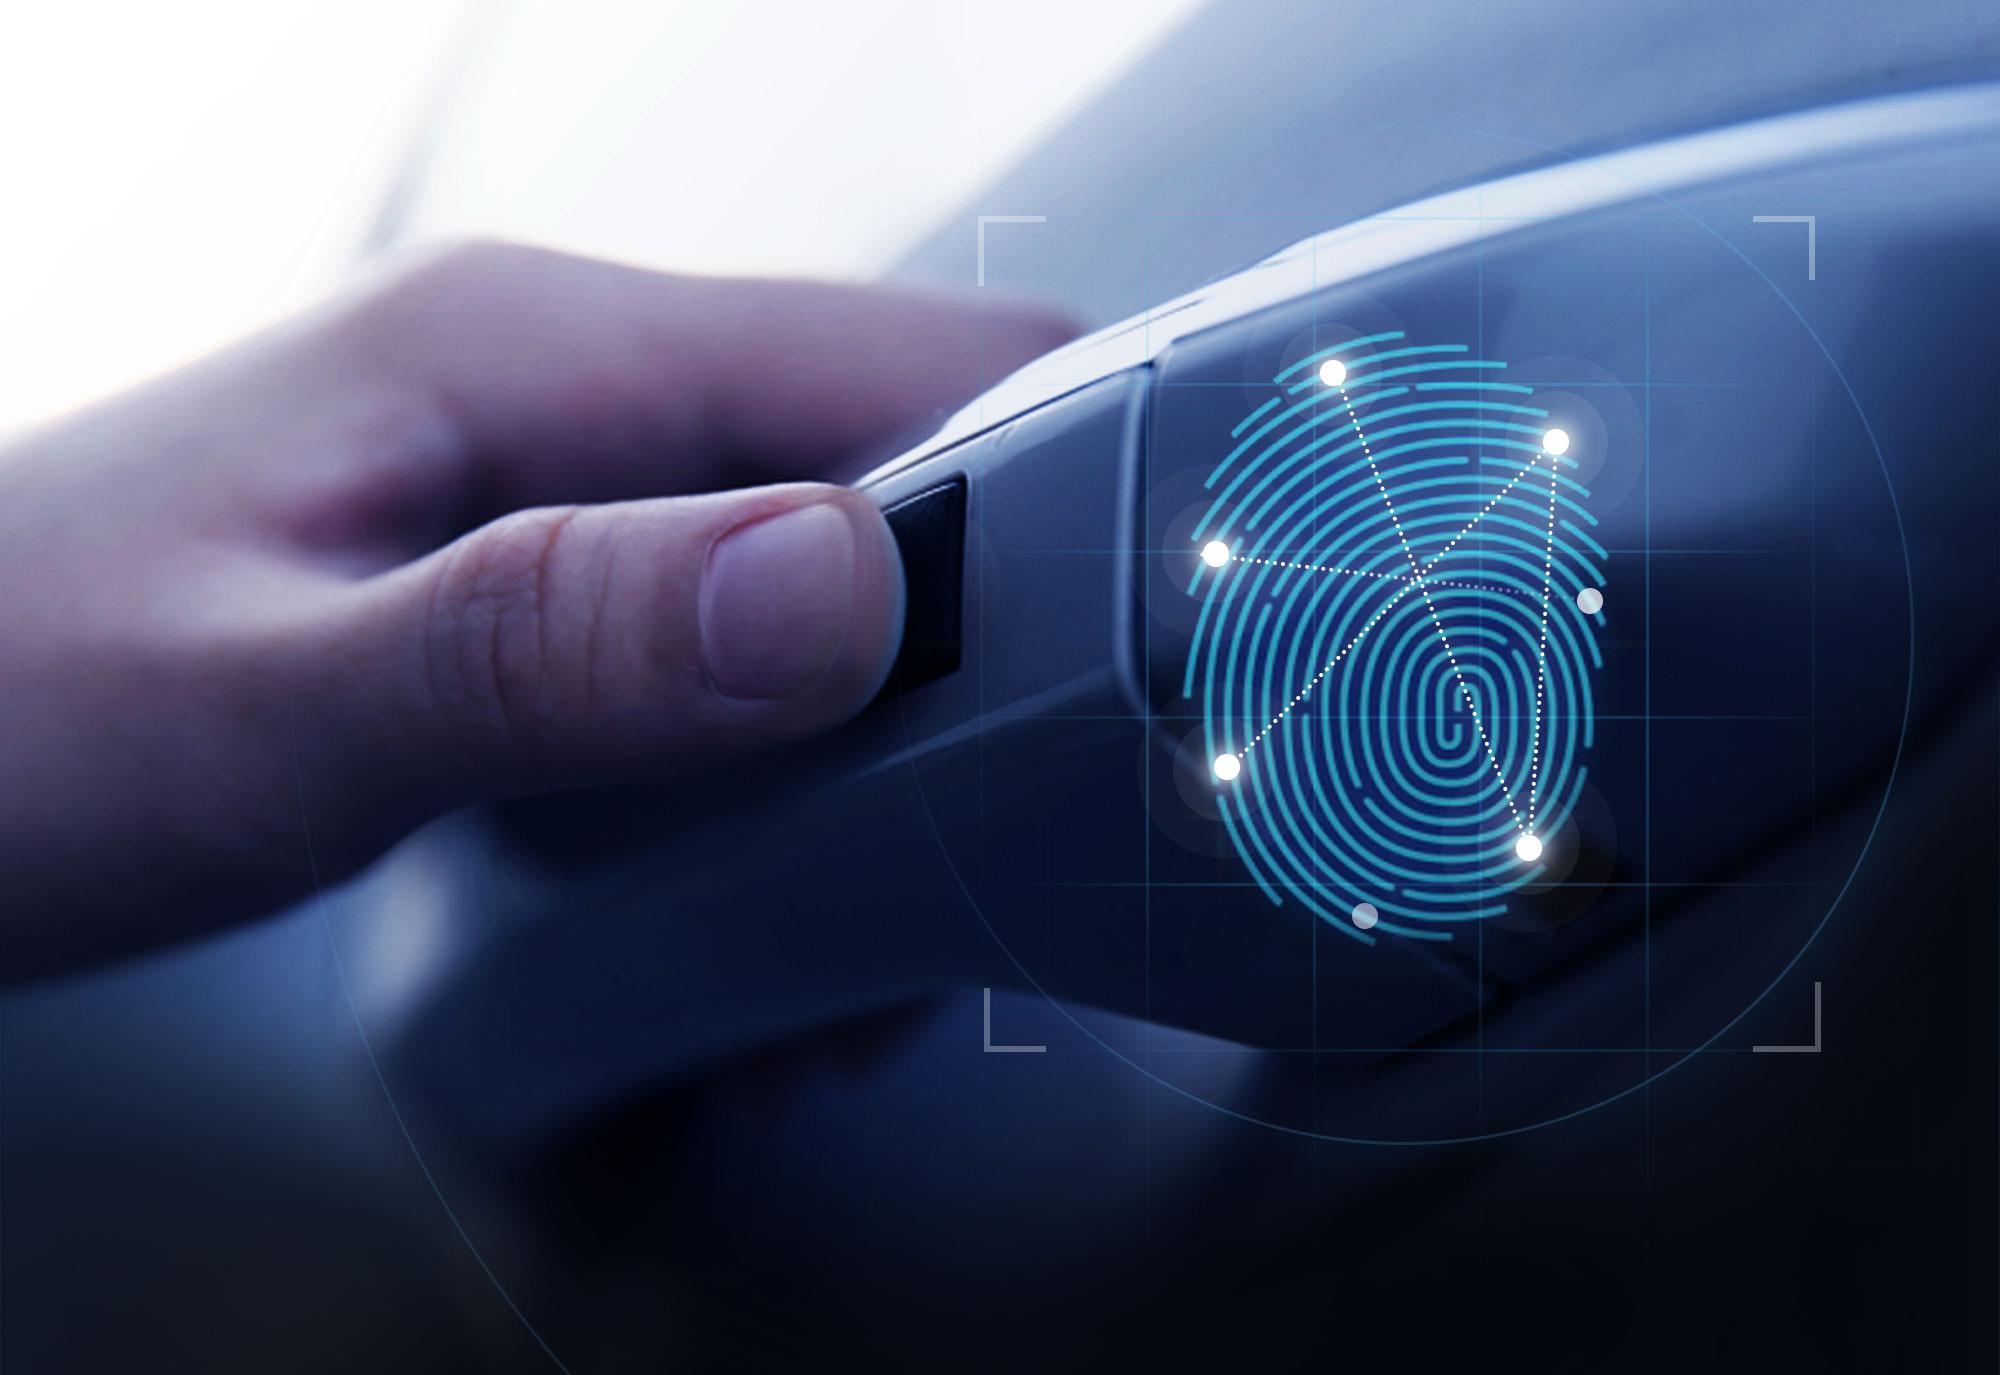 Hyundai-Fingerprint-technology_press-photo1.jpg